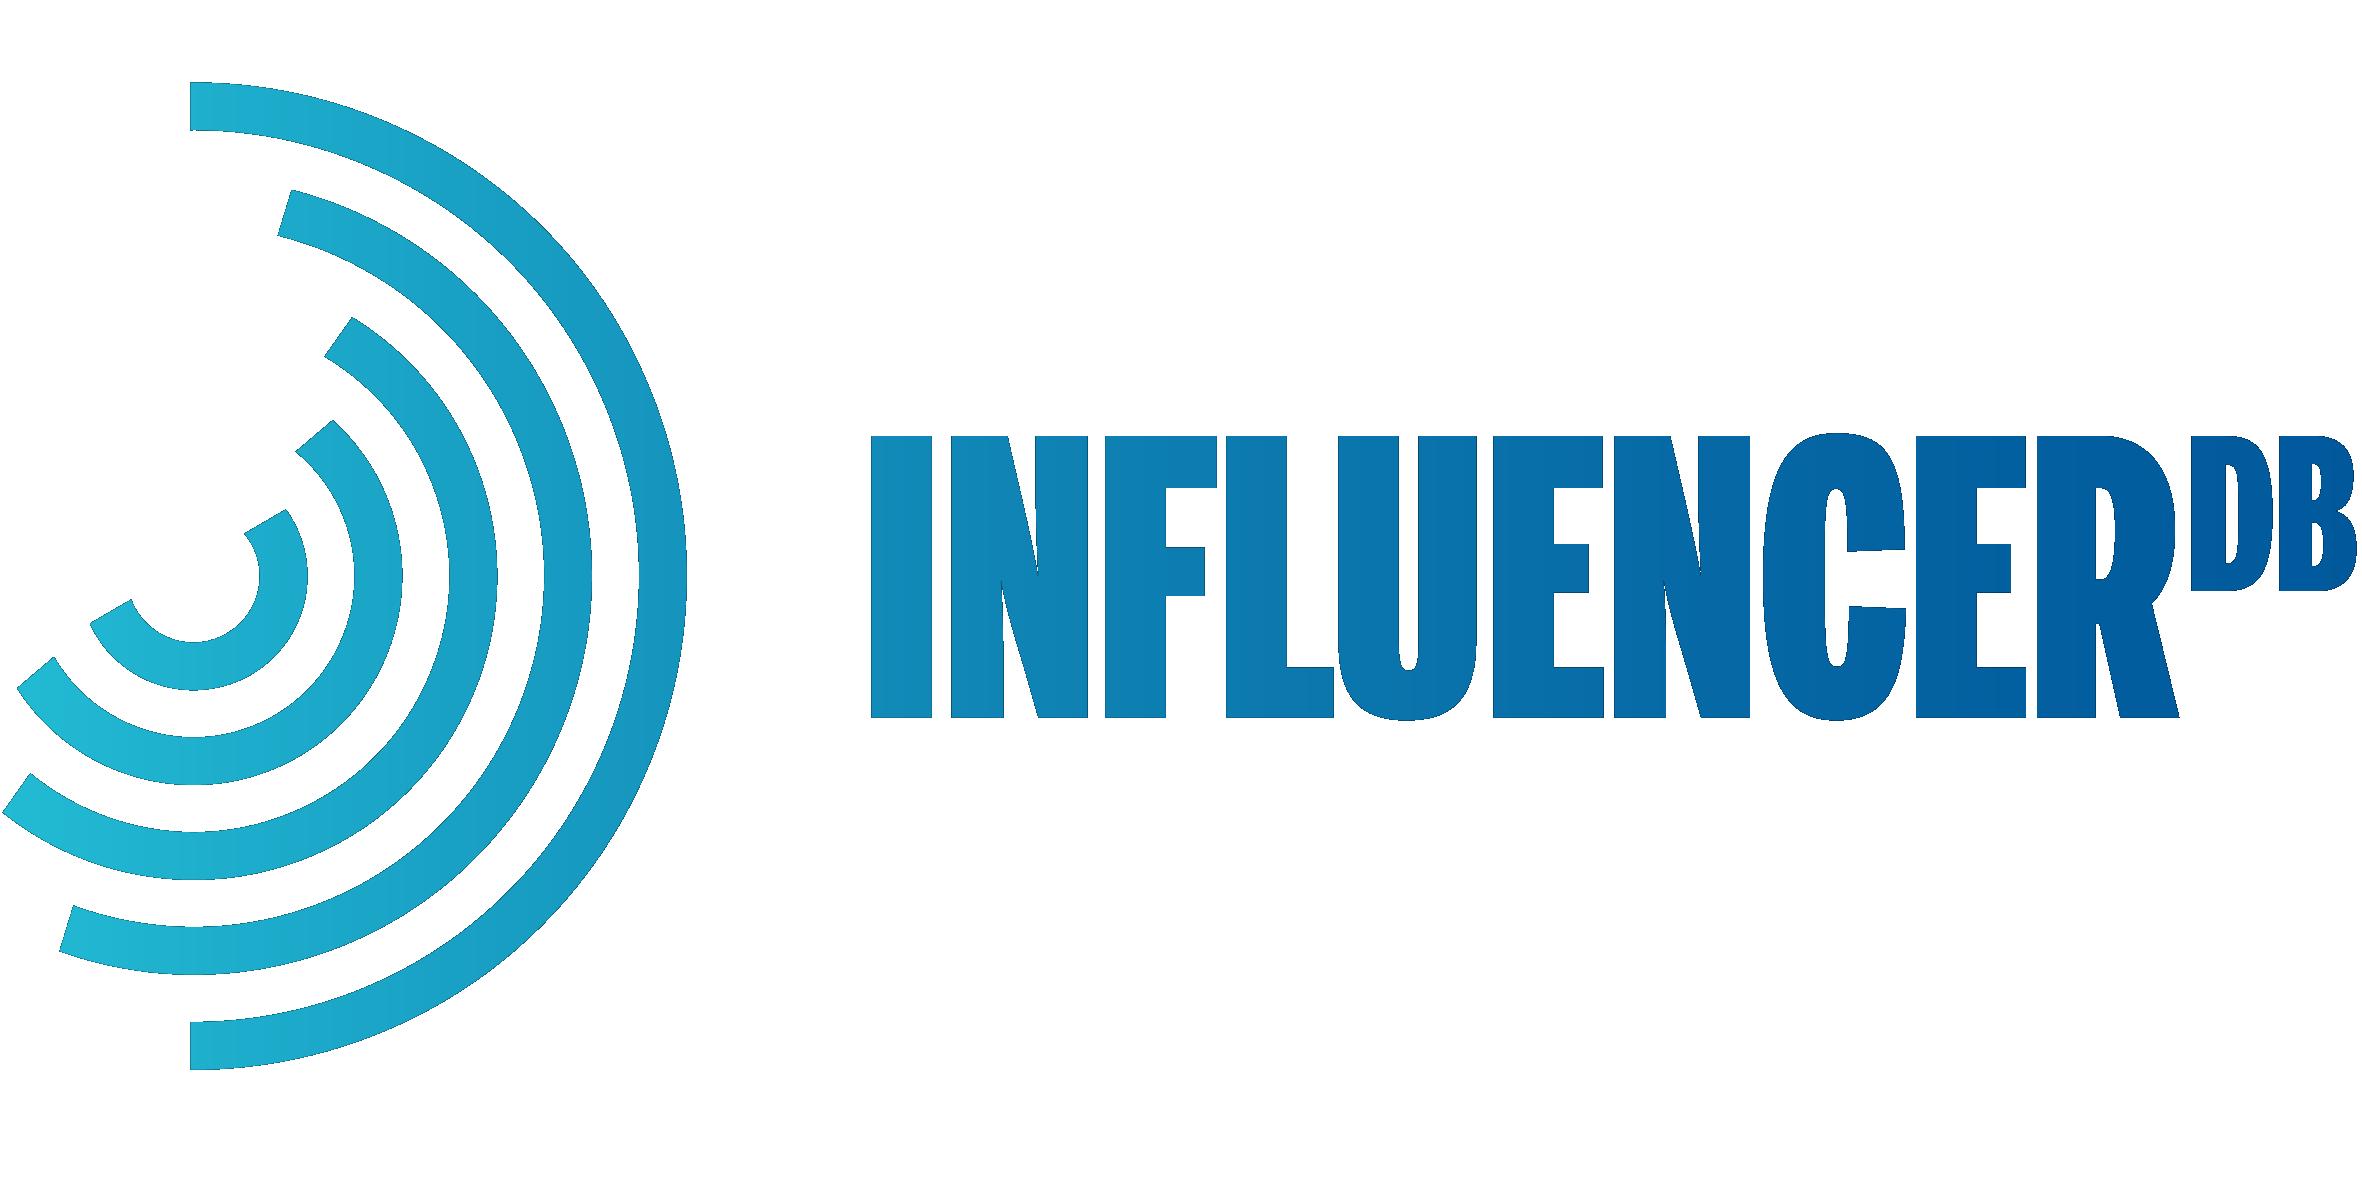 InfluencerDBLogo-Positive_horizonta_RGB